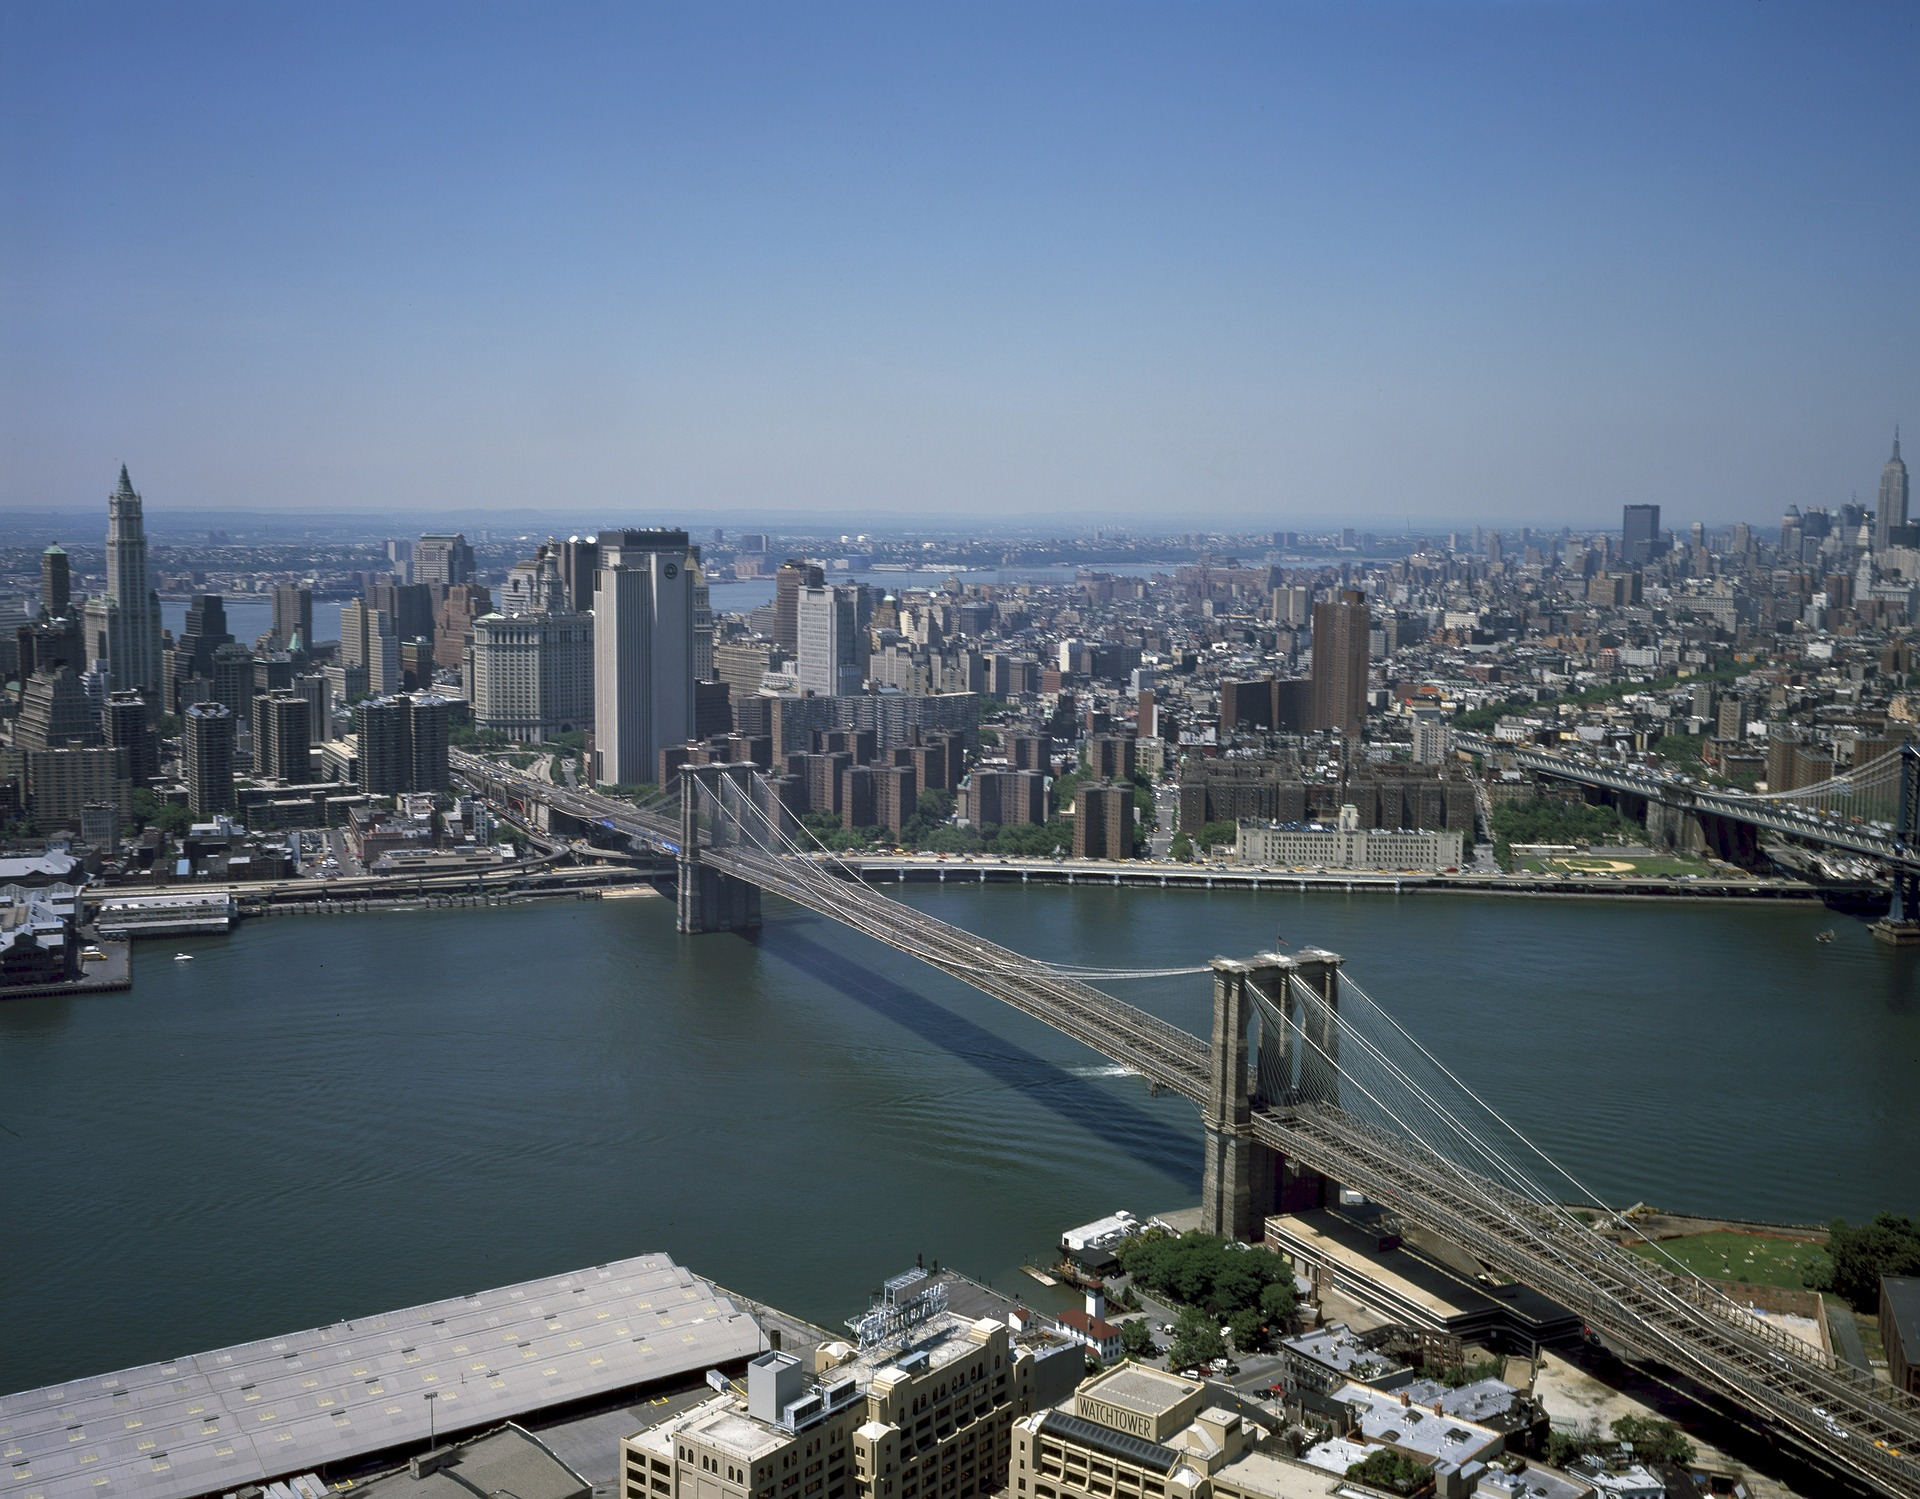 Aerial View of Brooklyn Bridge and Manhattan, New York City